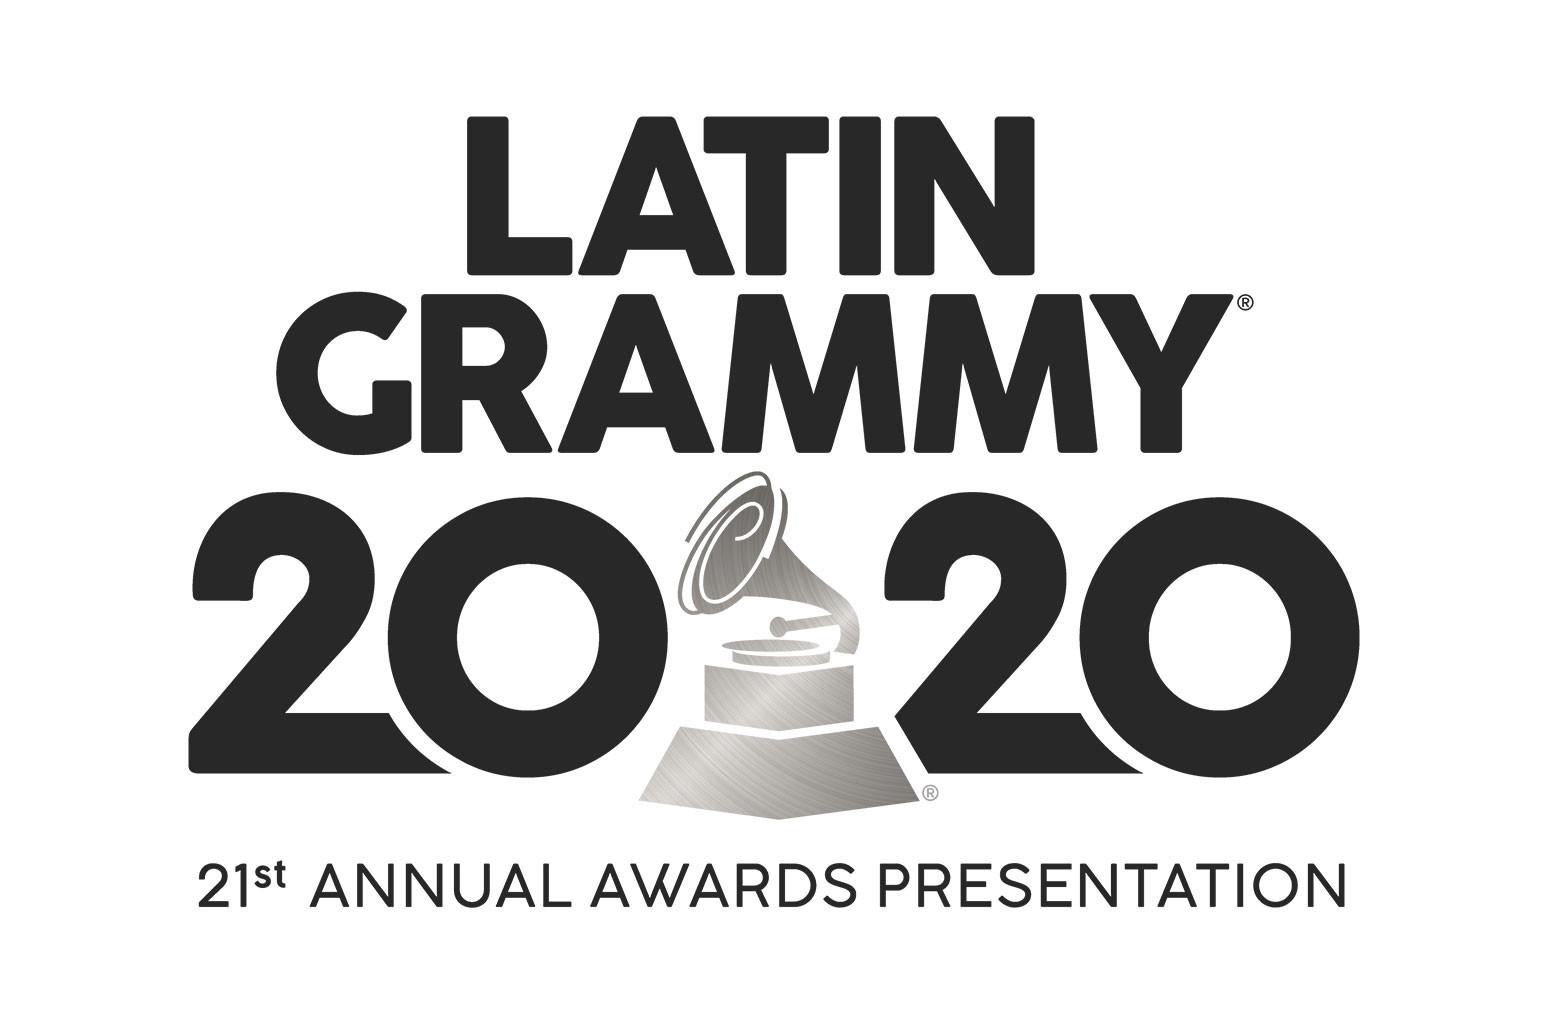 2020 latin grammys predictions who will win who should win billboard billboard